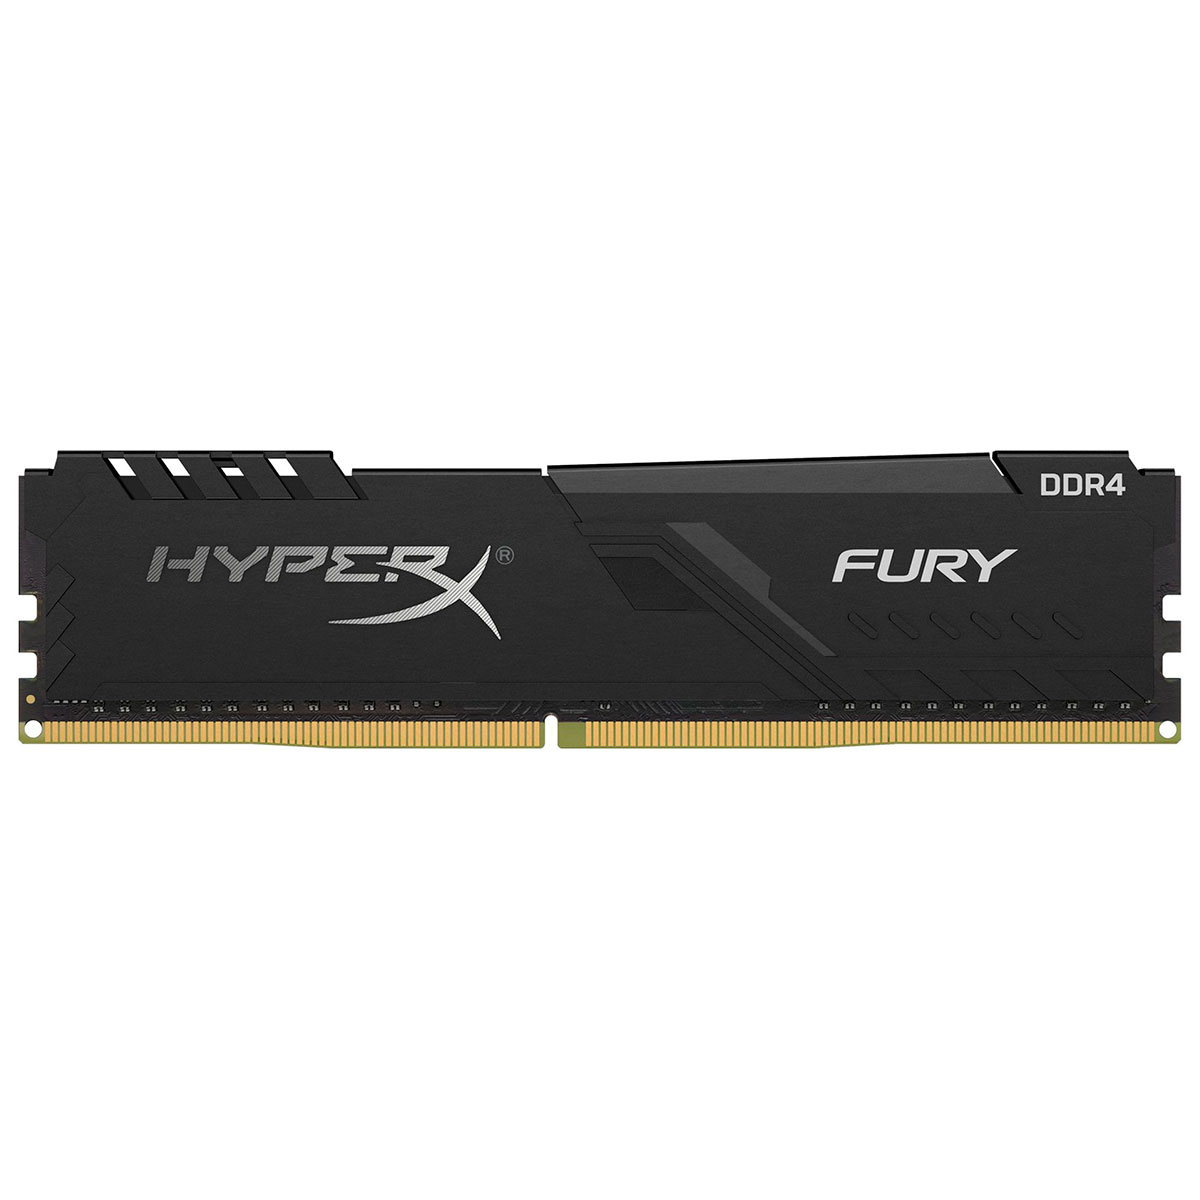 Memória Gamer Kingston HyperX Fury Black, 8GB, 2666MHz, DDR4, CL16 - HX426C16FB3/8